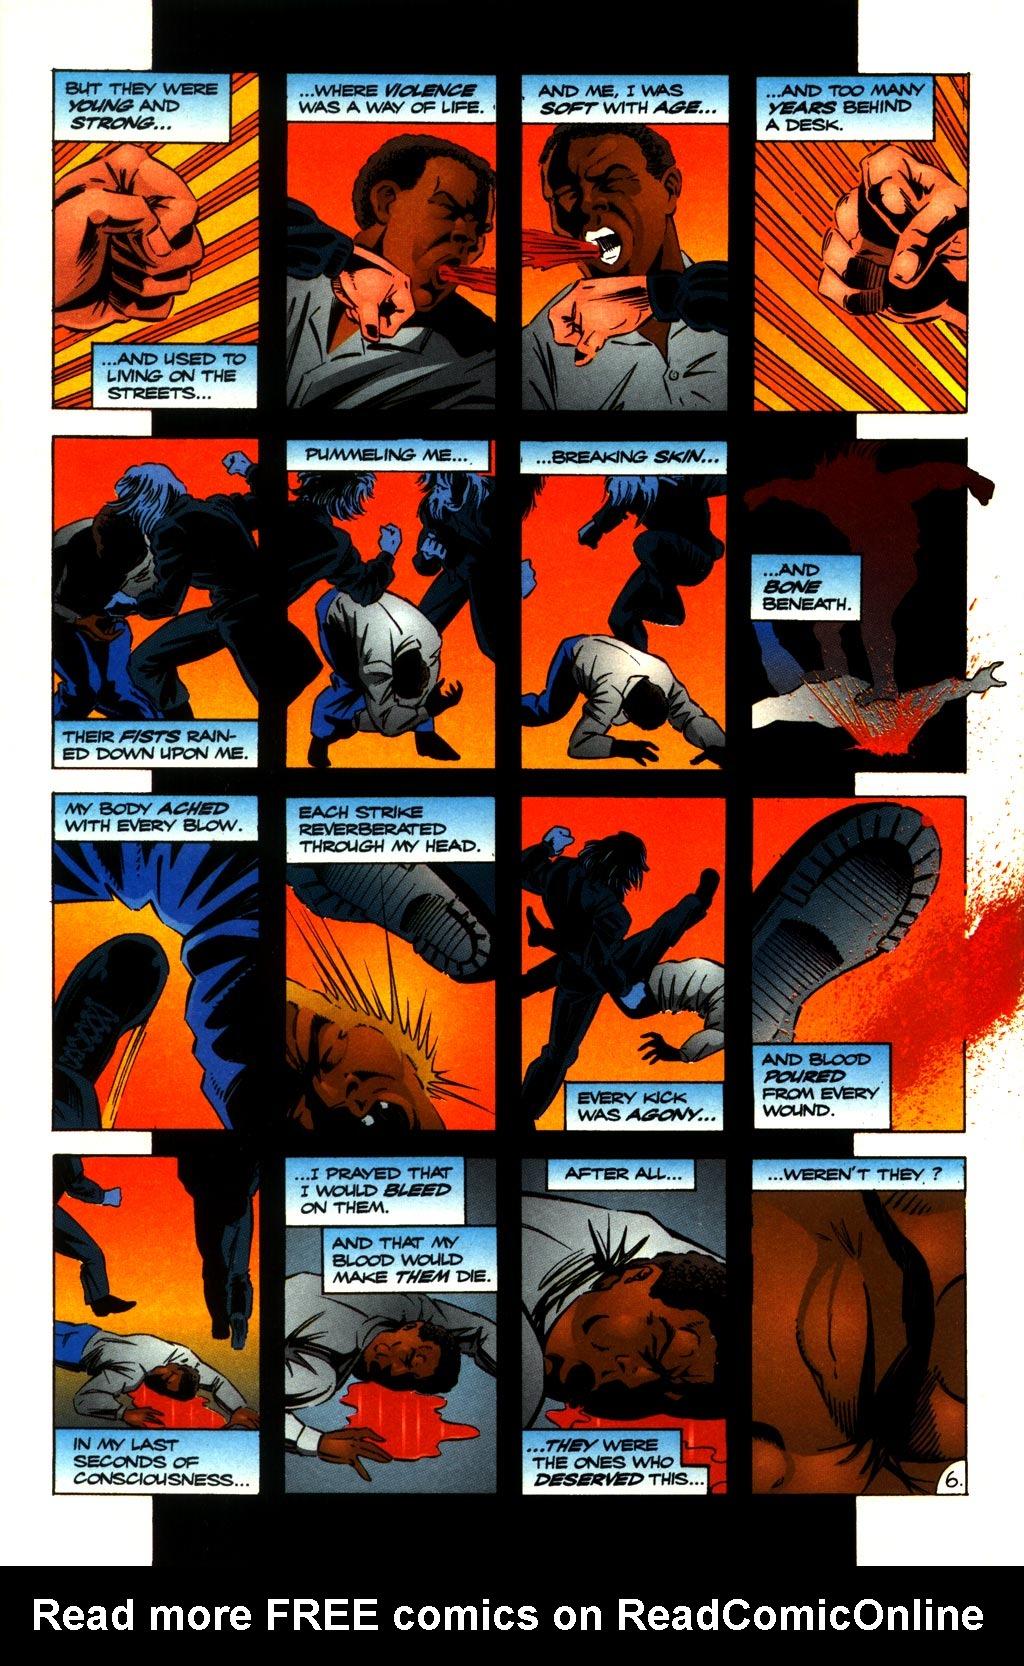 Read online ShadowHawk comic -  Issue #10 - 8